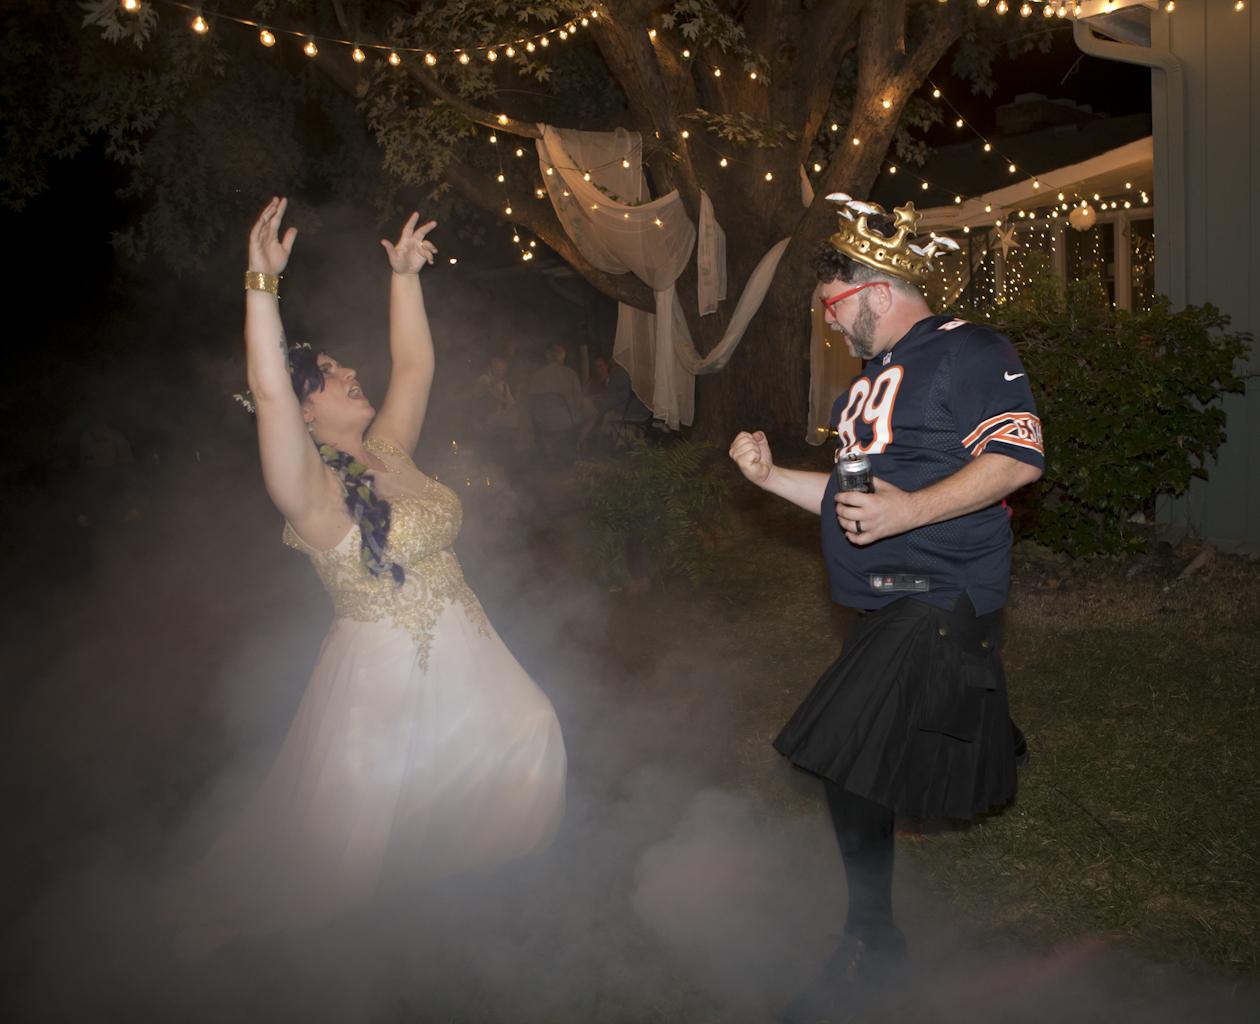 Tina and Adam wedding_Studio Misha Wedding Photography Asheville Photographer and Videographer00127.JPG